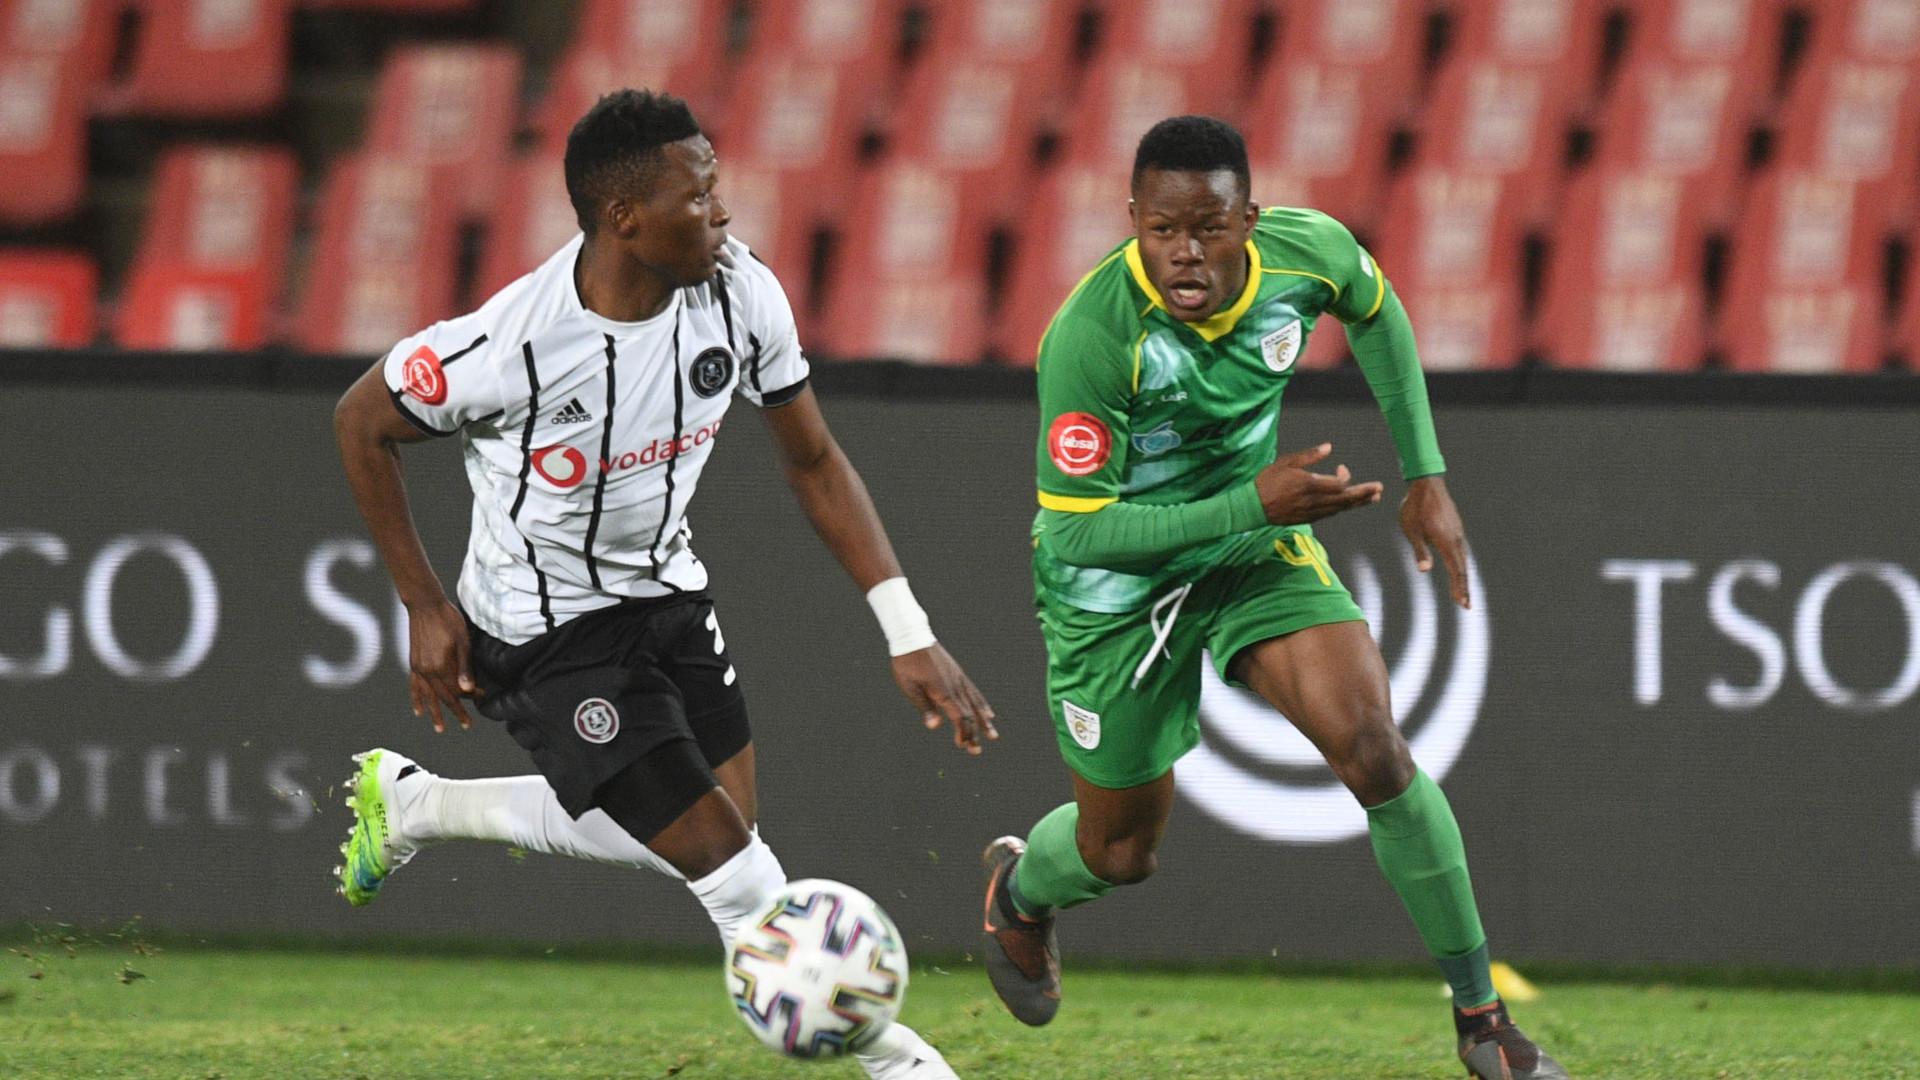 Absa Premiership 2019/20 | Orlando Pirates v Baroka FC | Highlights